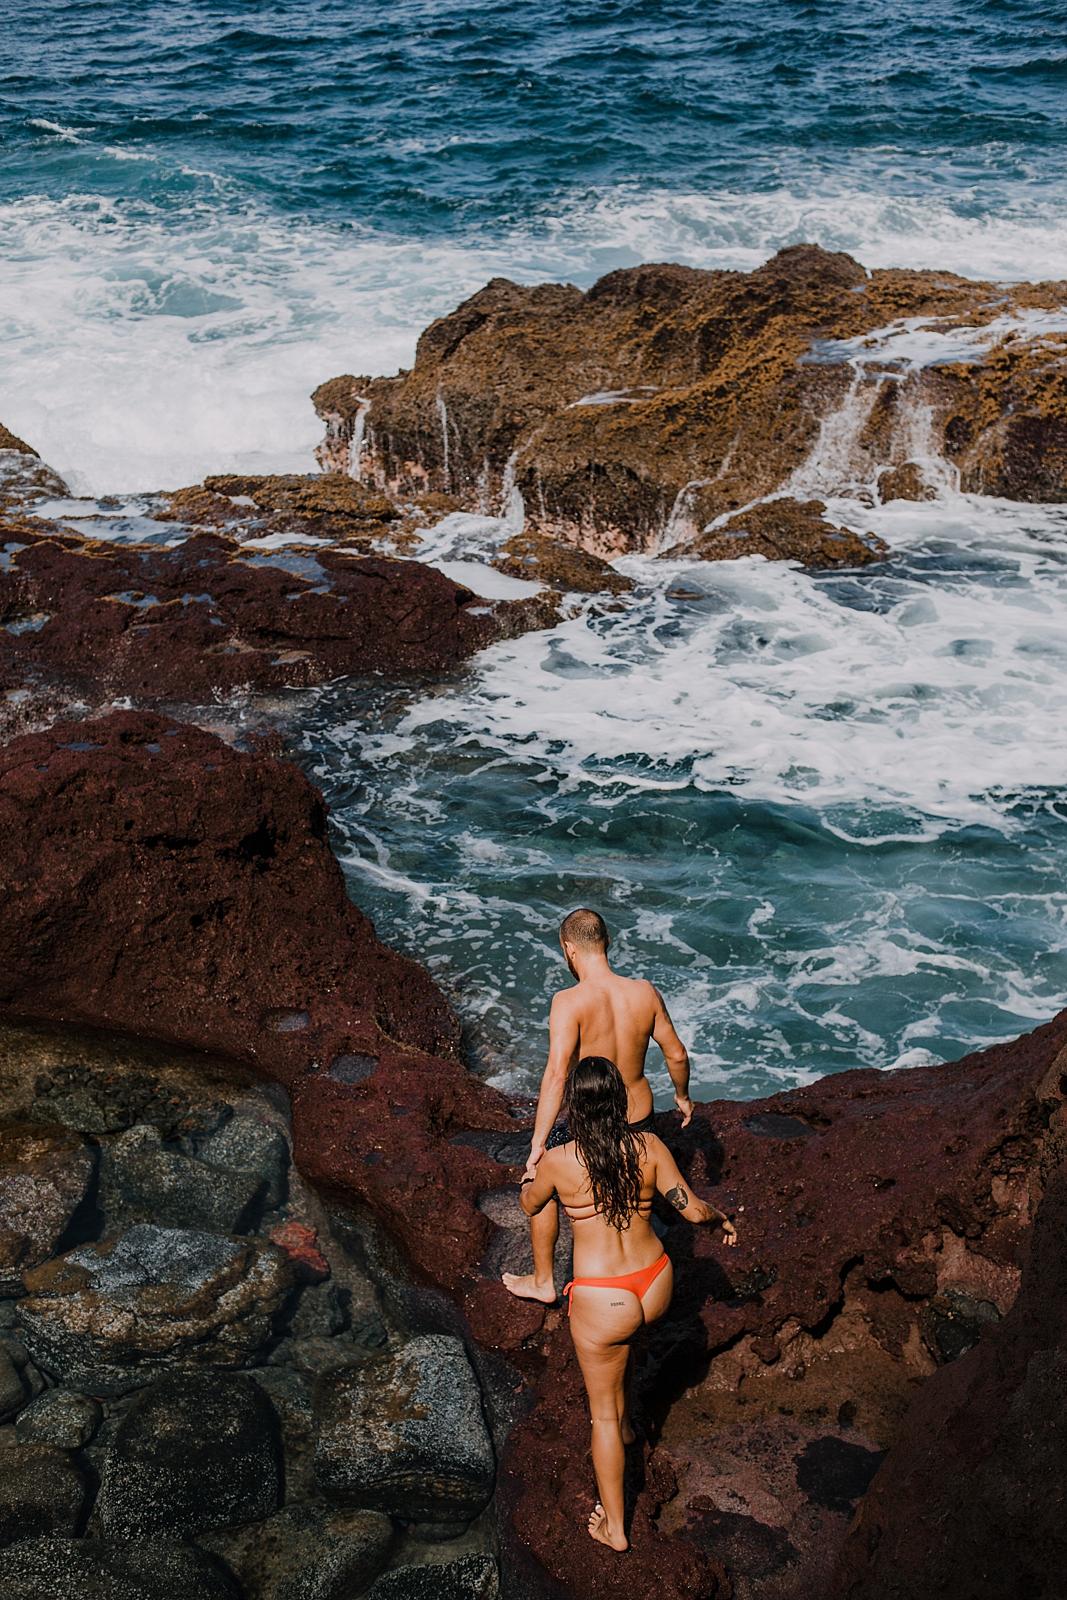 hiking to chutes and ladders in maui hawaii, maui swimsuit engagements, hawaii tide pools hike, hawaiian coastline, hiking the maui coast